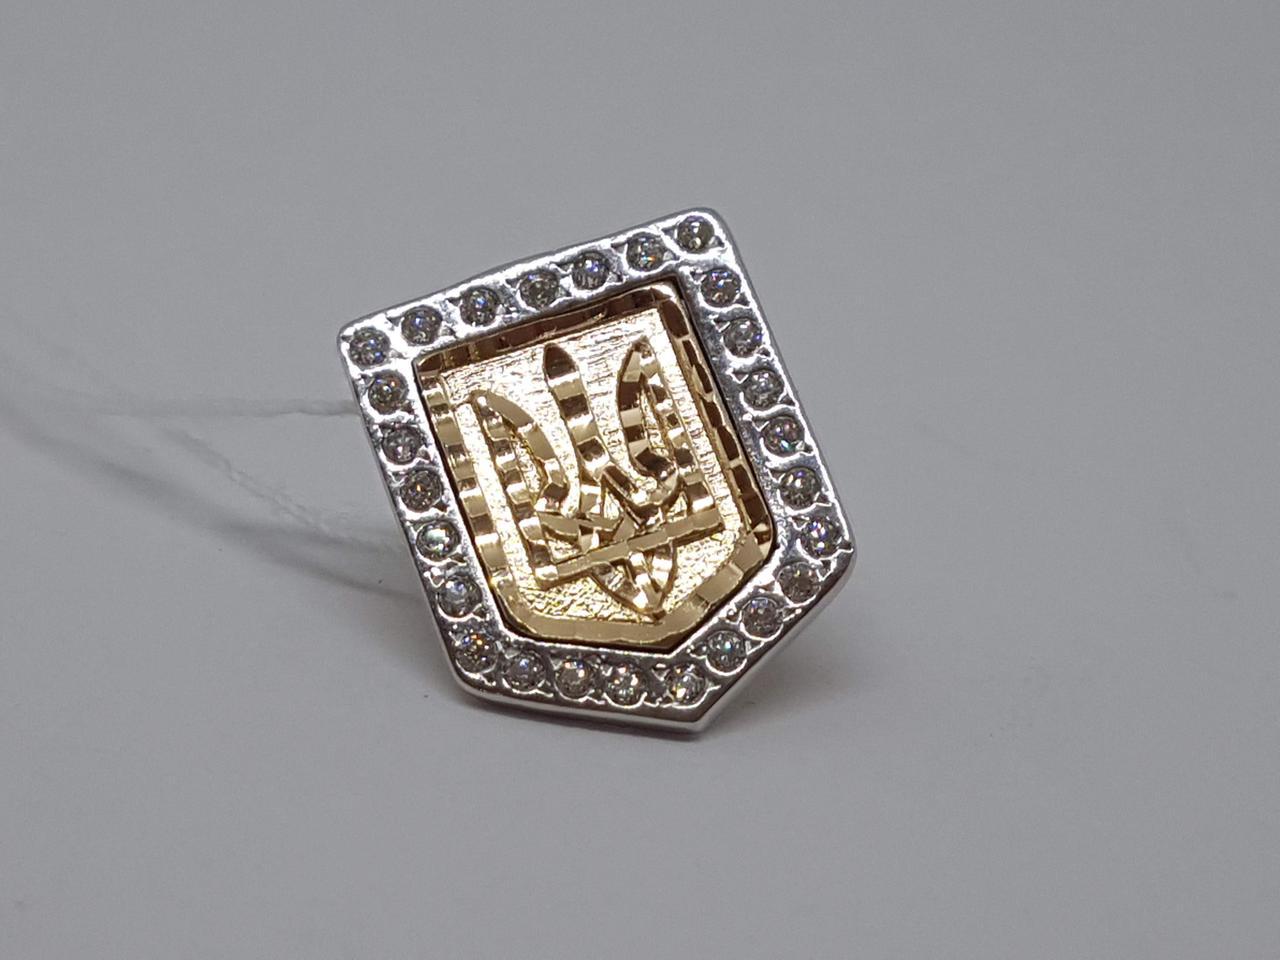 Золотой значок Трезубец с фианитами. Артикул 021001